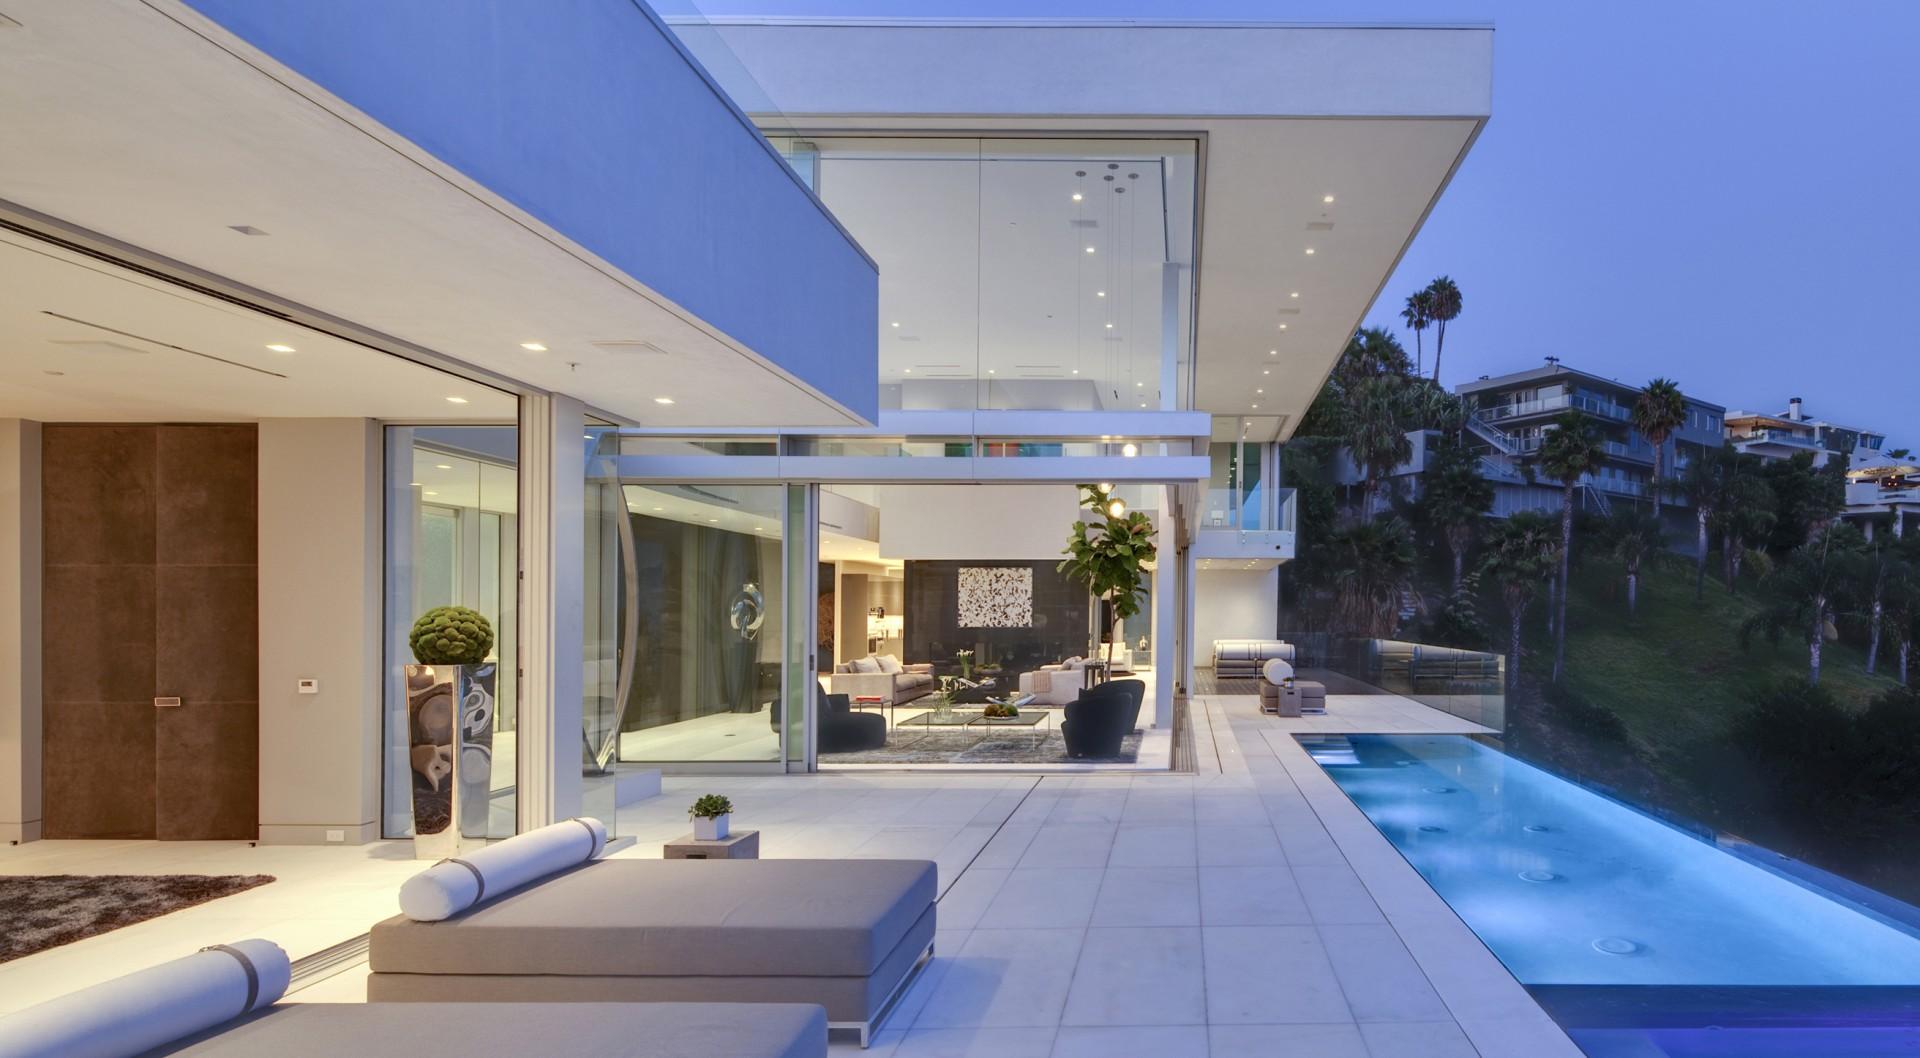 Pool, Terrace